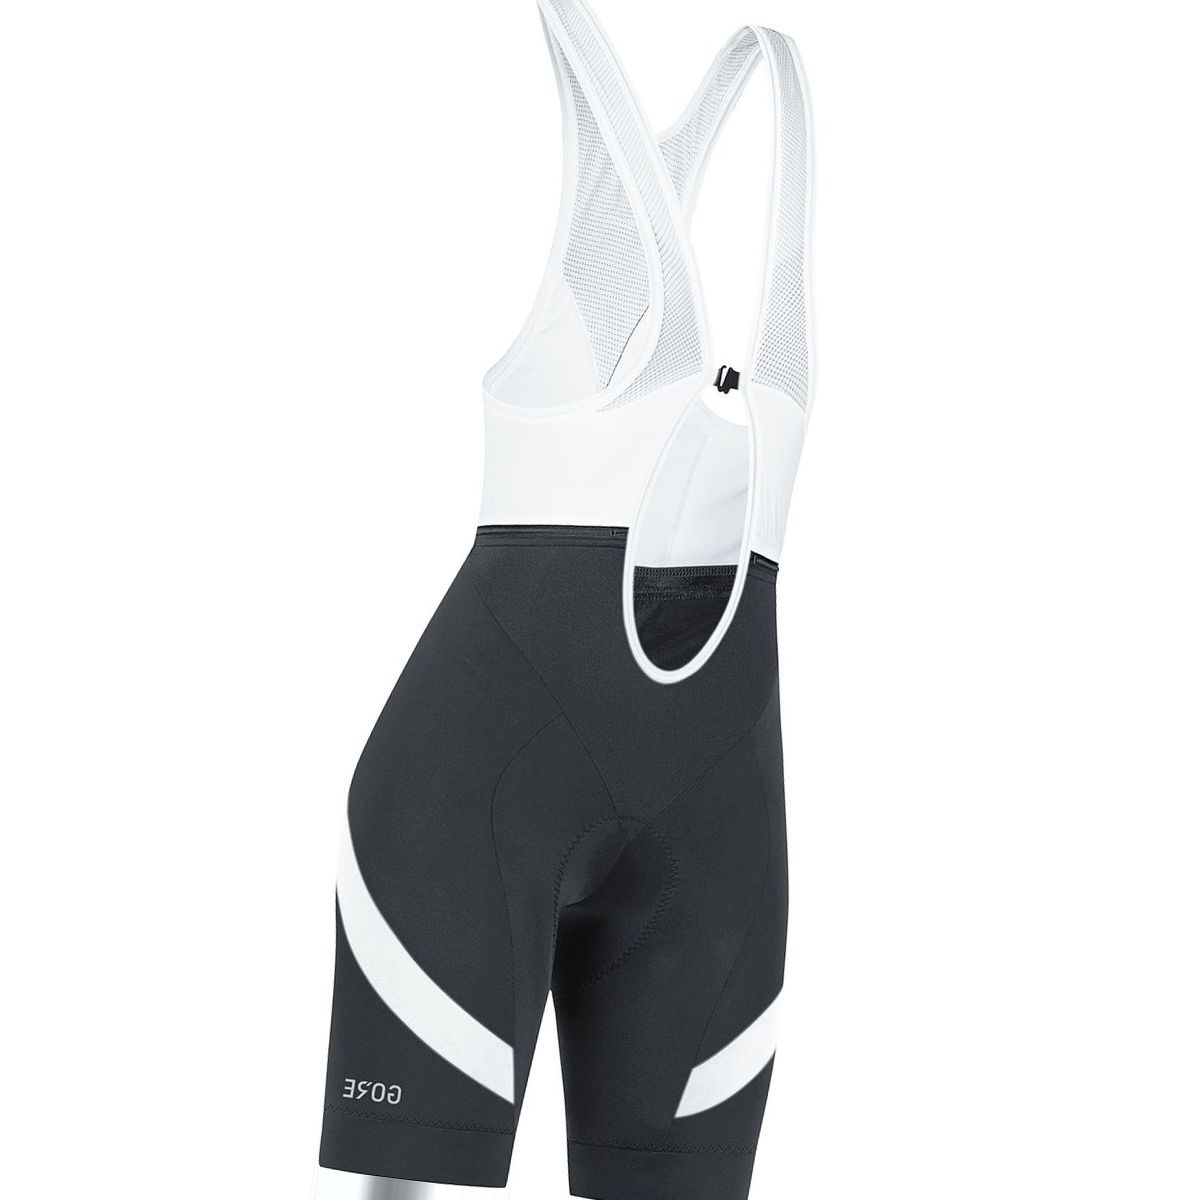 Gore Wear C5 Bib Shorts+ - Women's